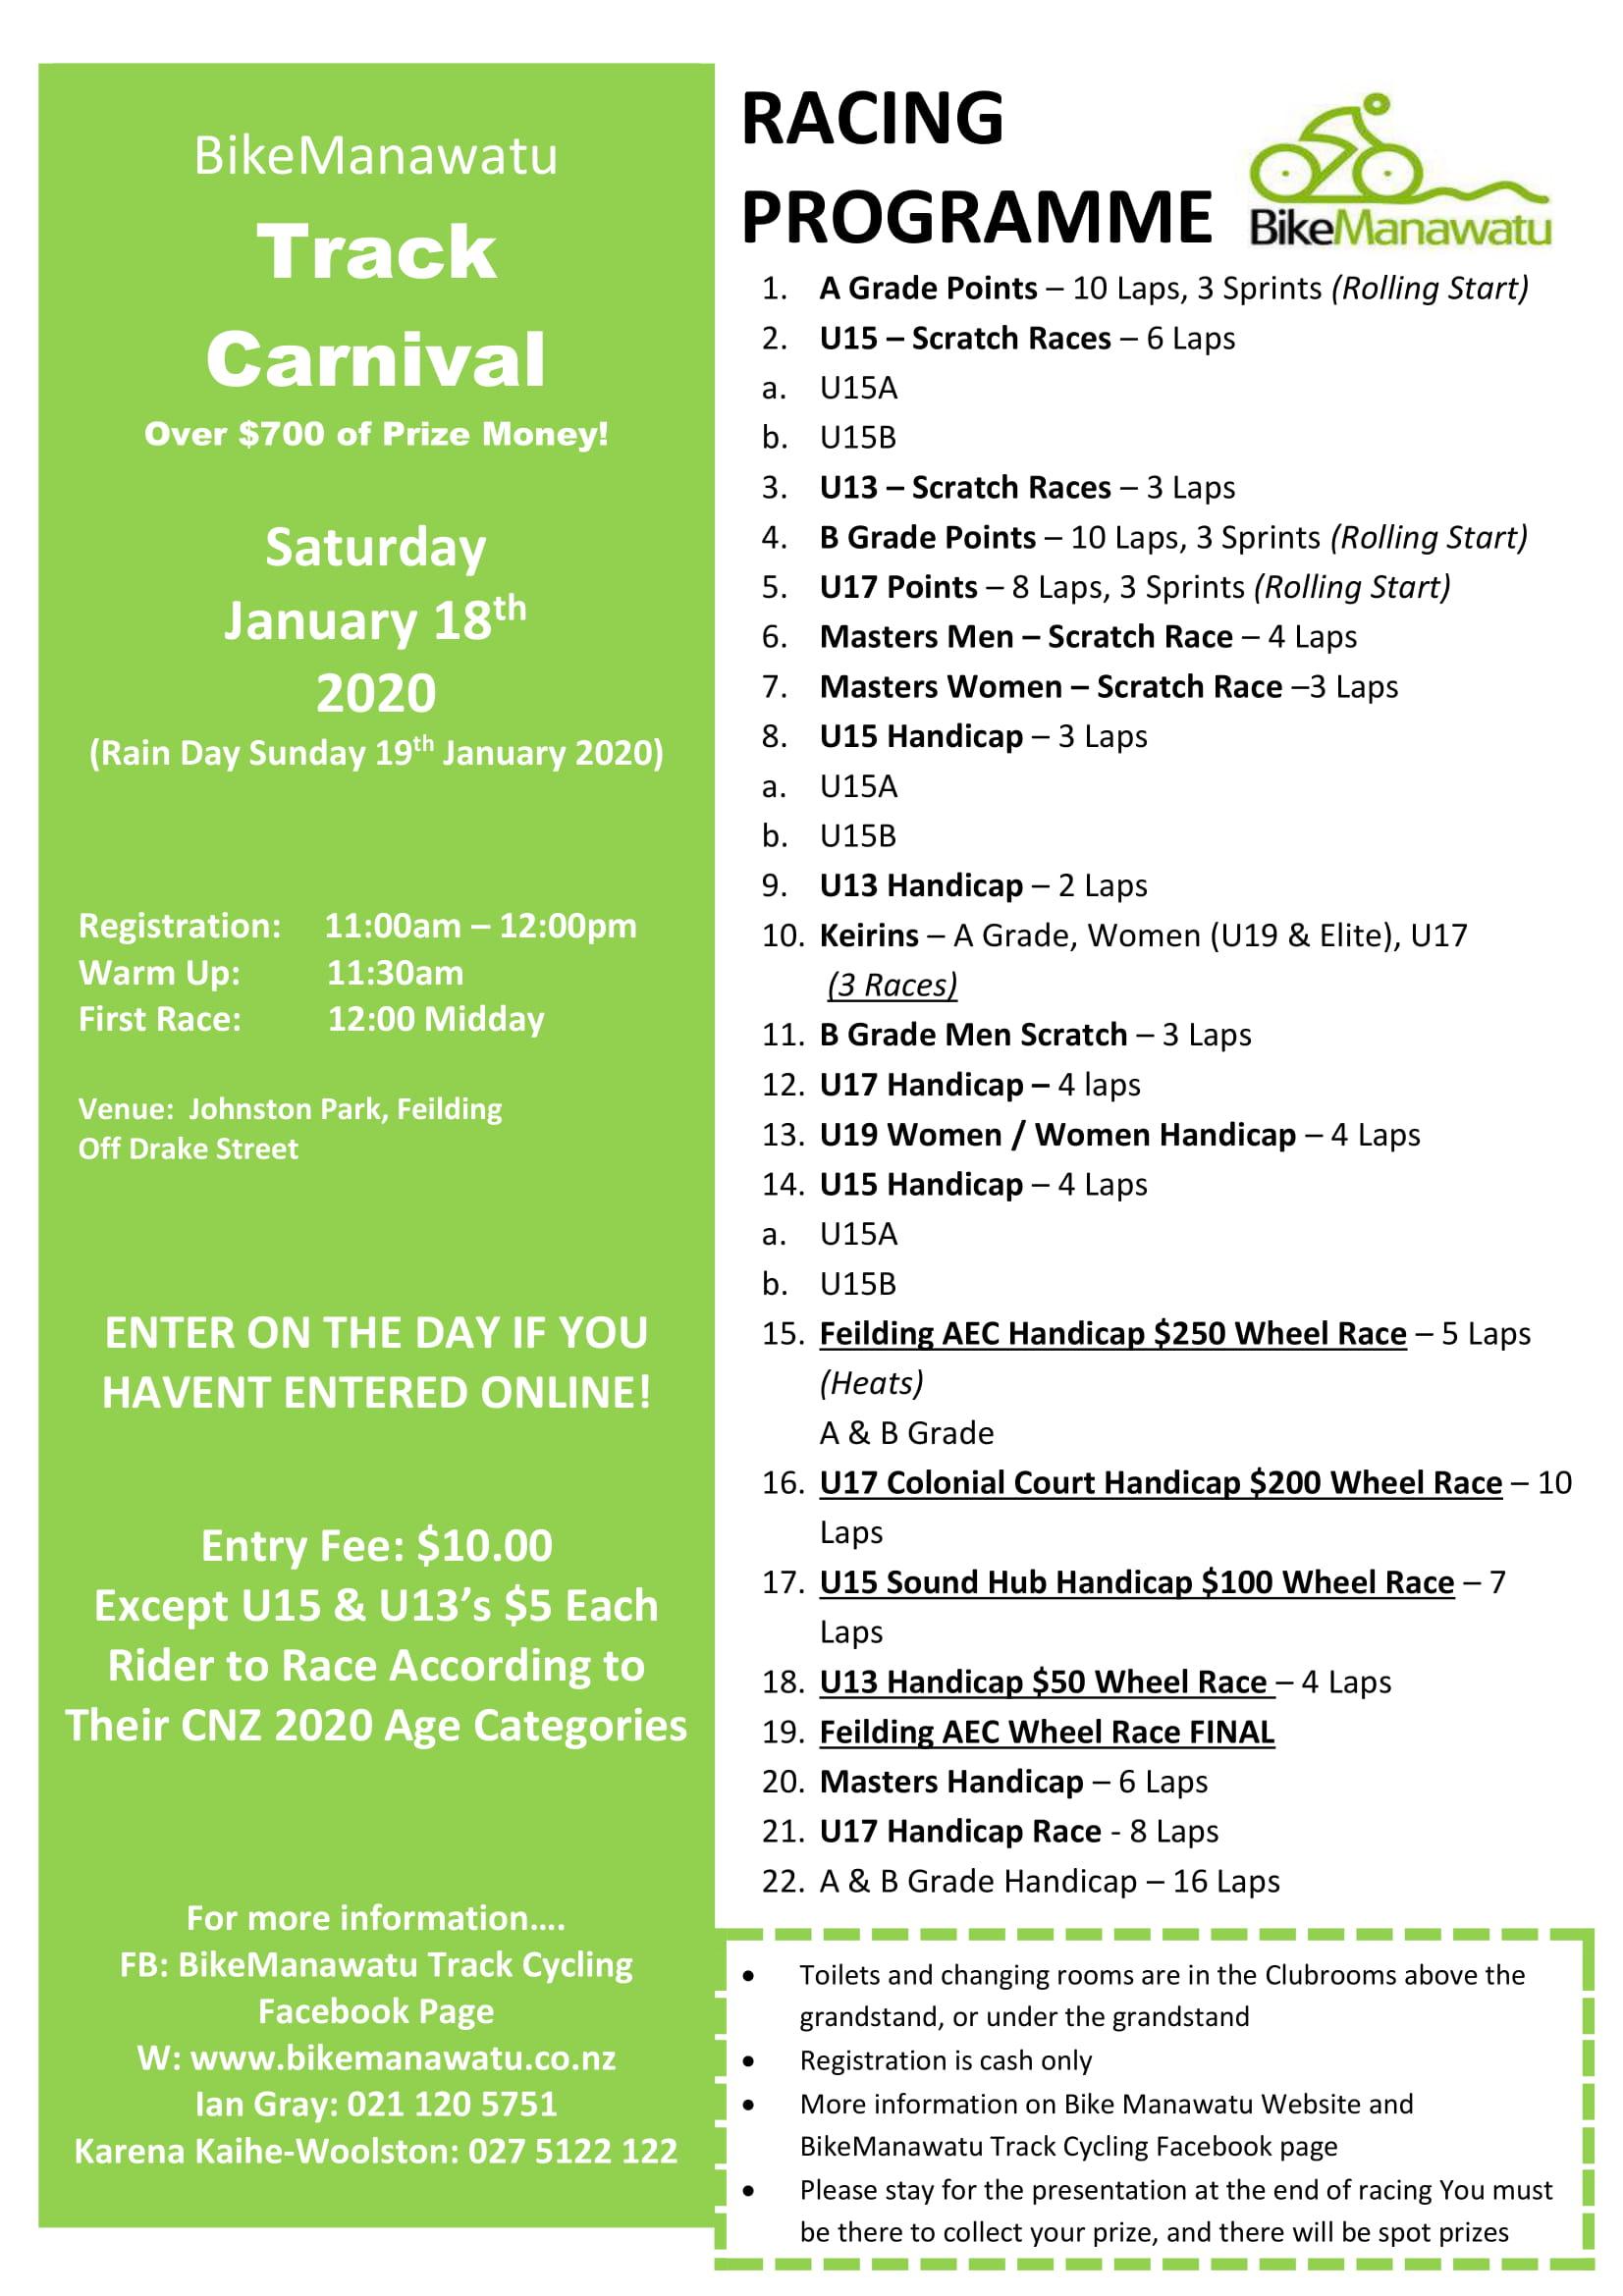 2020 Track Carnival Race Programme Sat 18th Jan-1.jpg